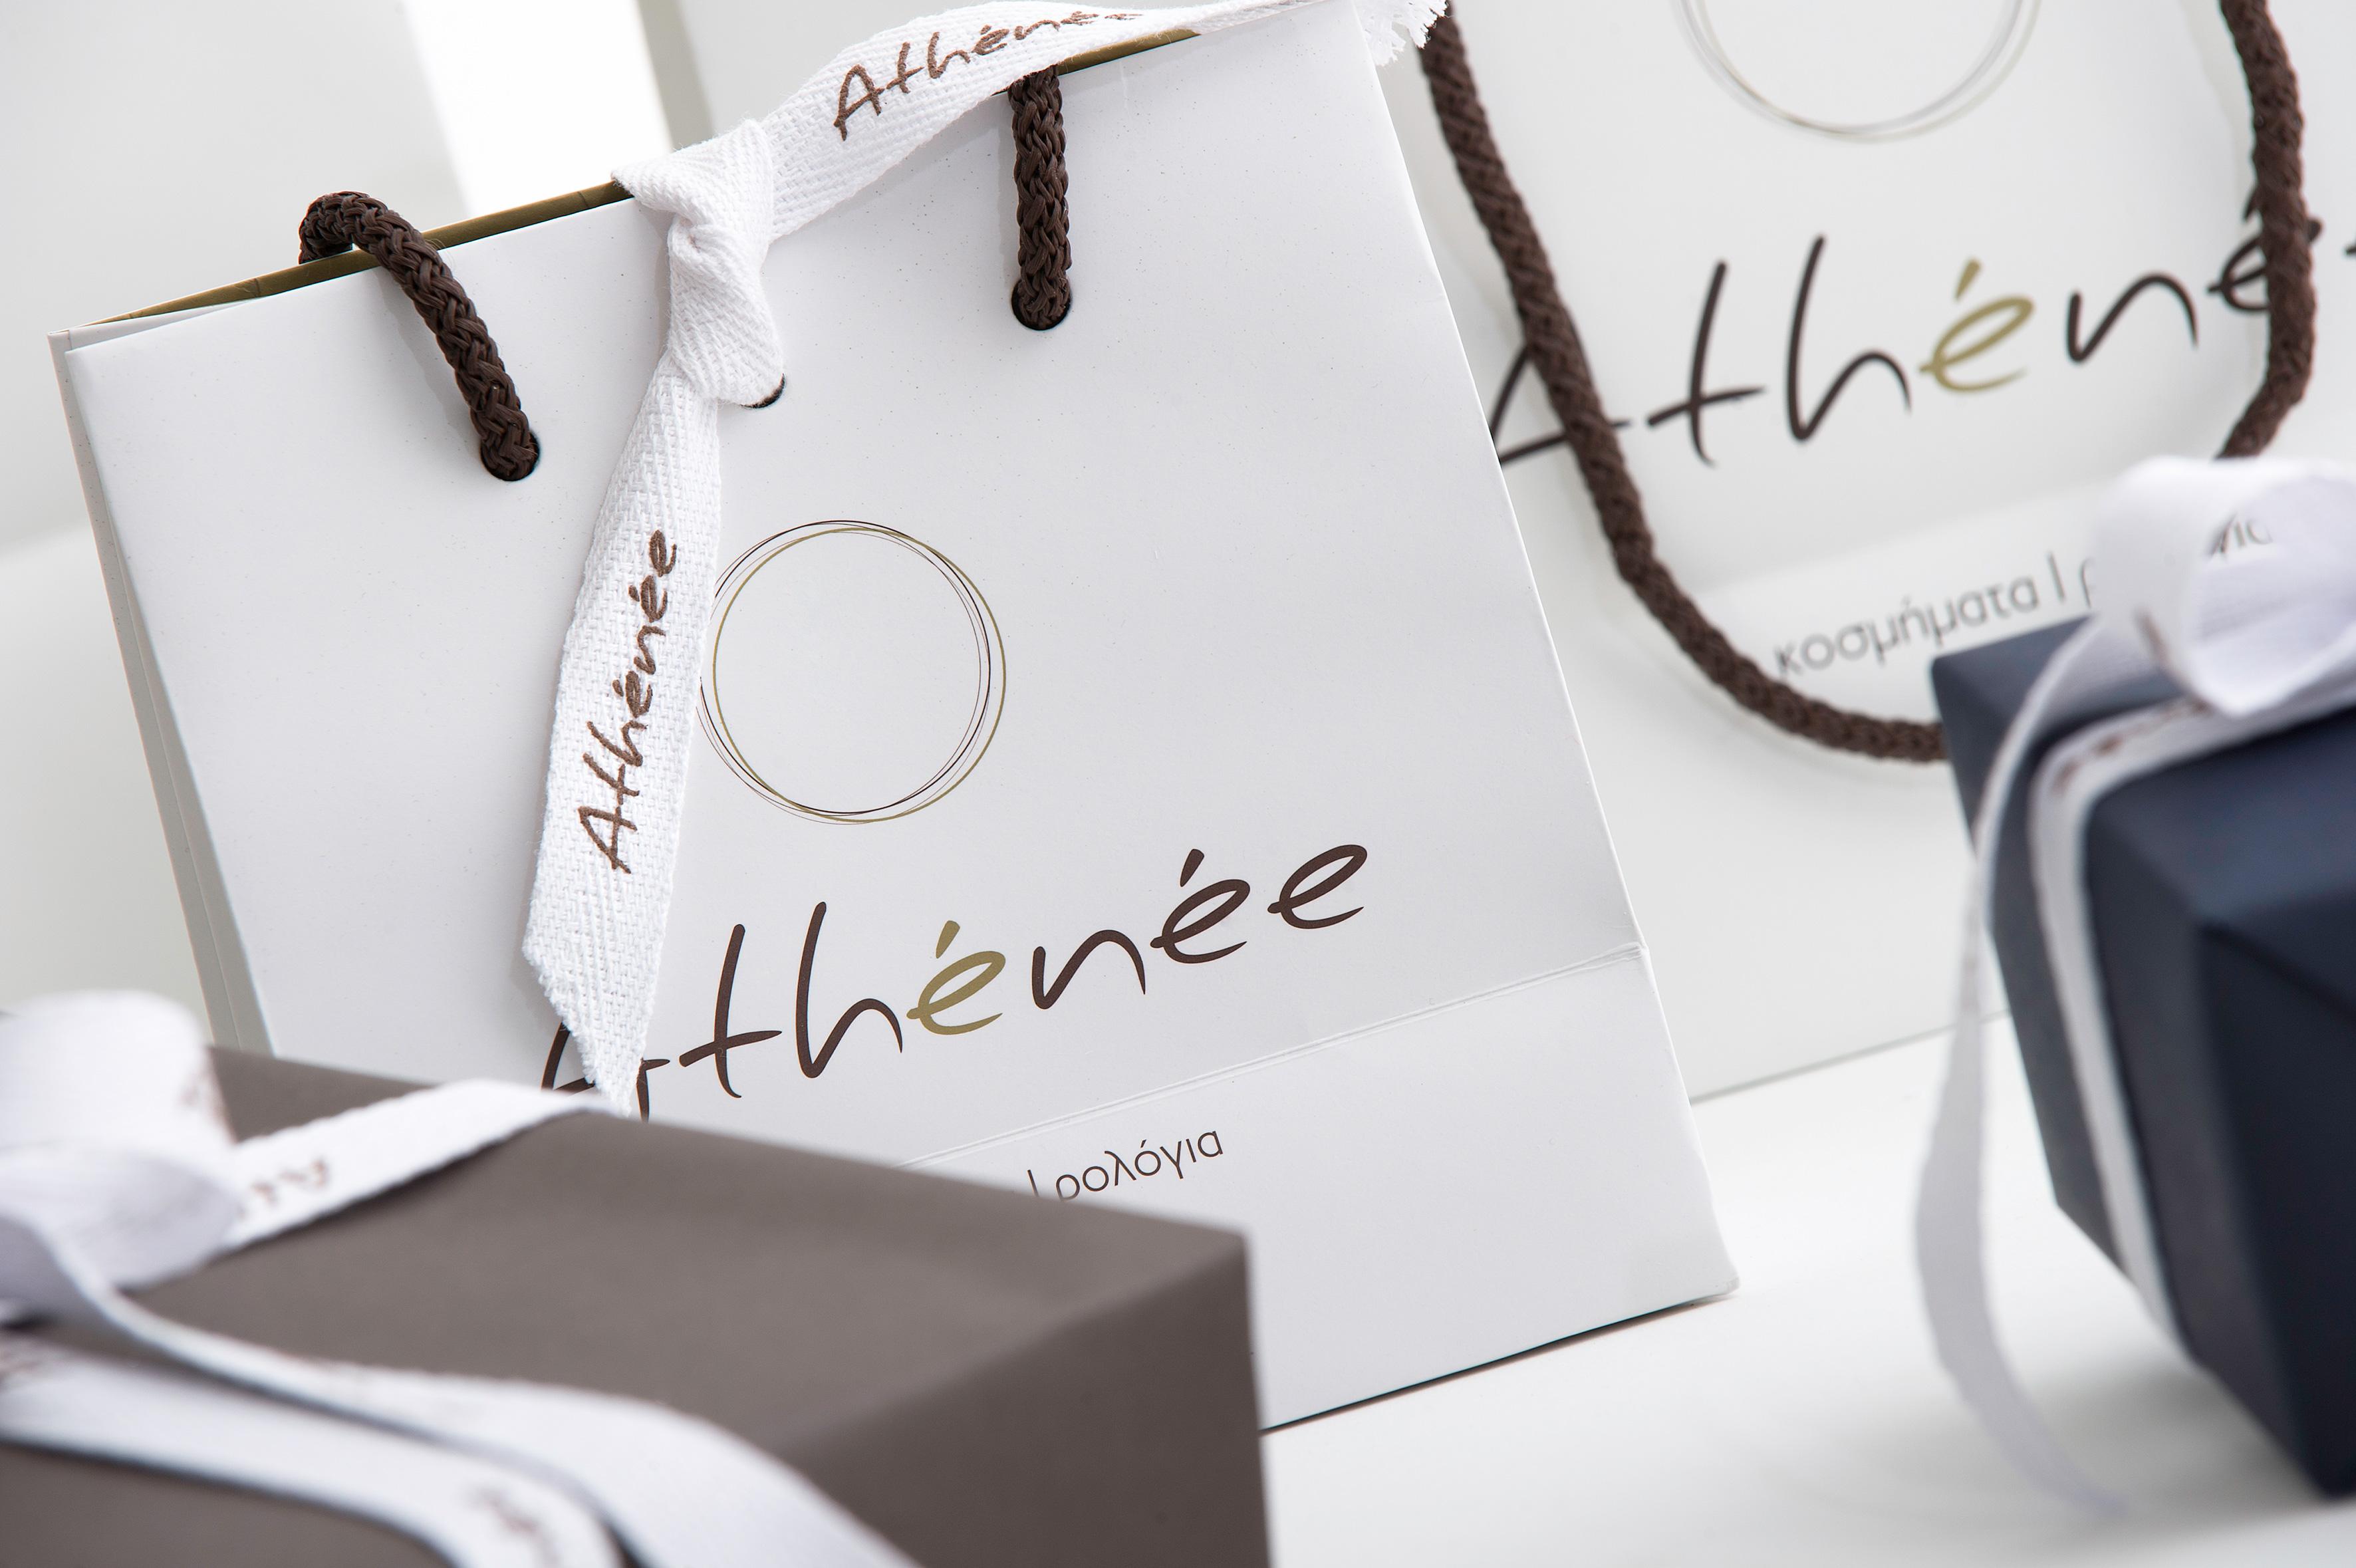 Athenee_D3S5237-copy